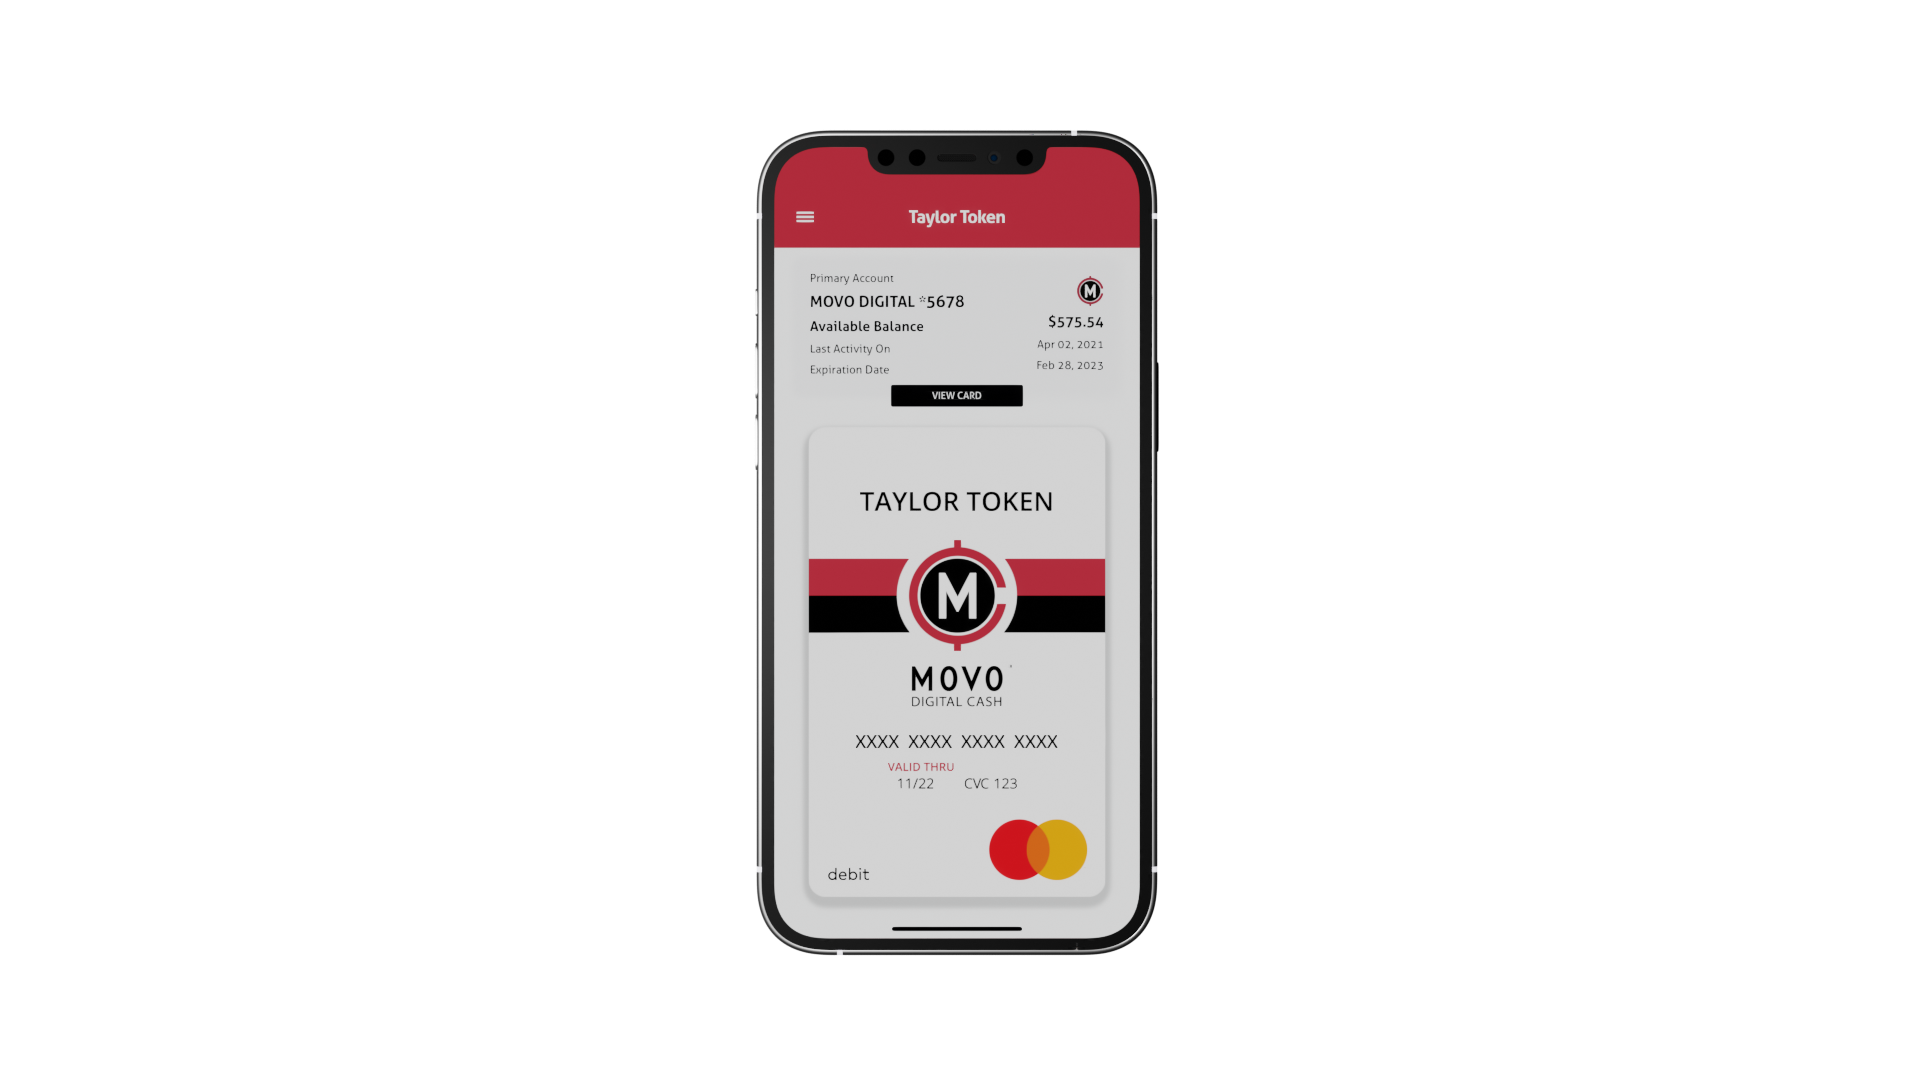 Digital MOVO debit card